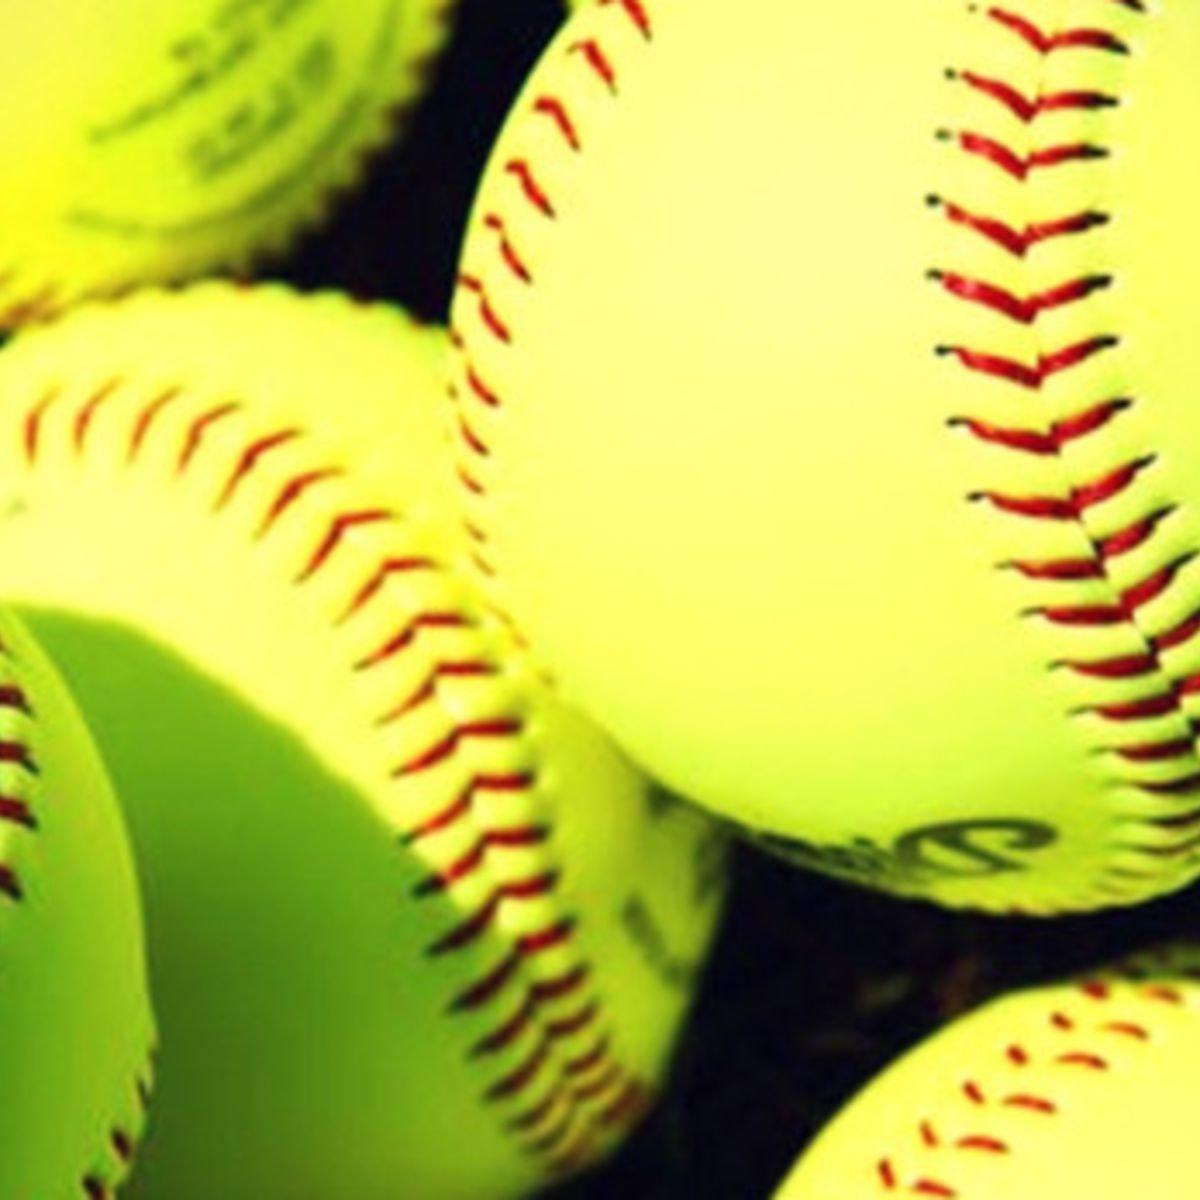 May contain: sports, sport, team sport, team, food, banana, plant, fruit, softball, and baseball